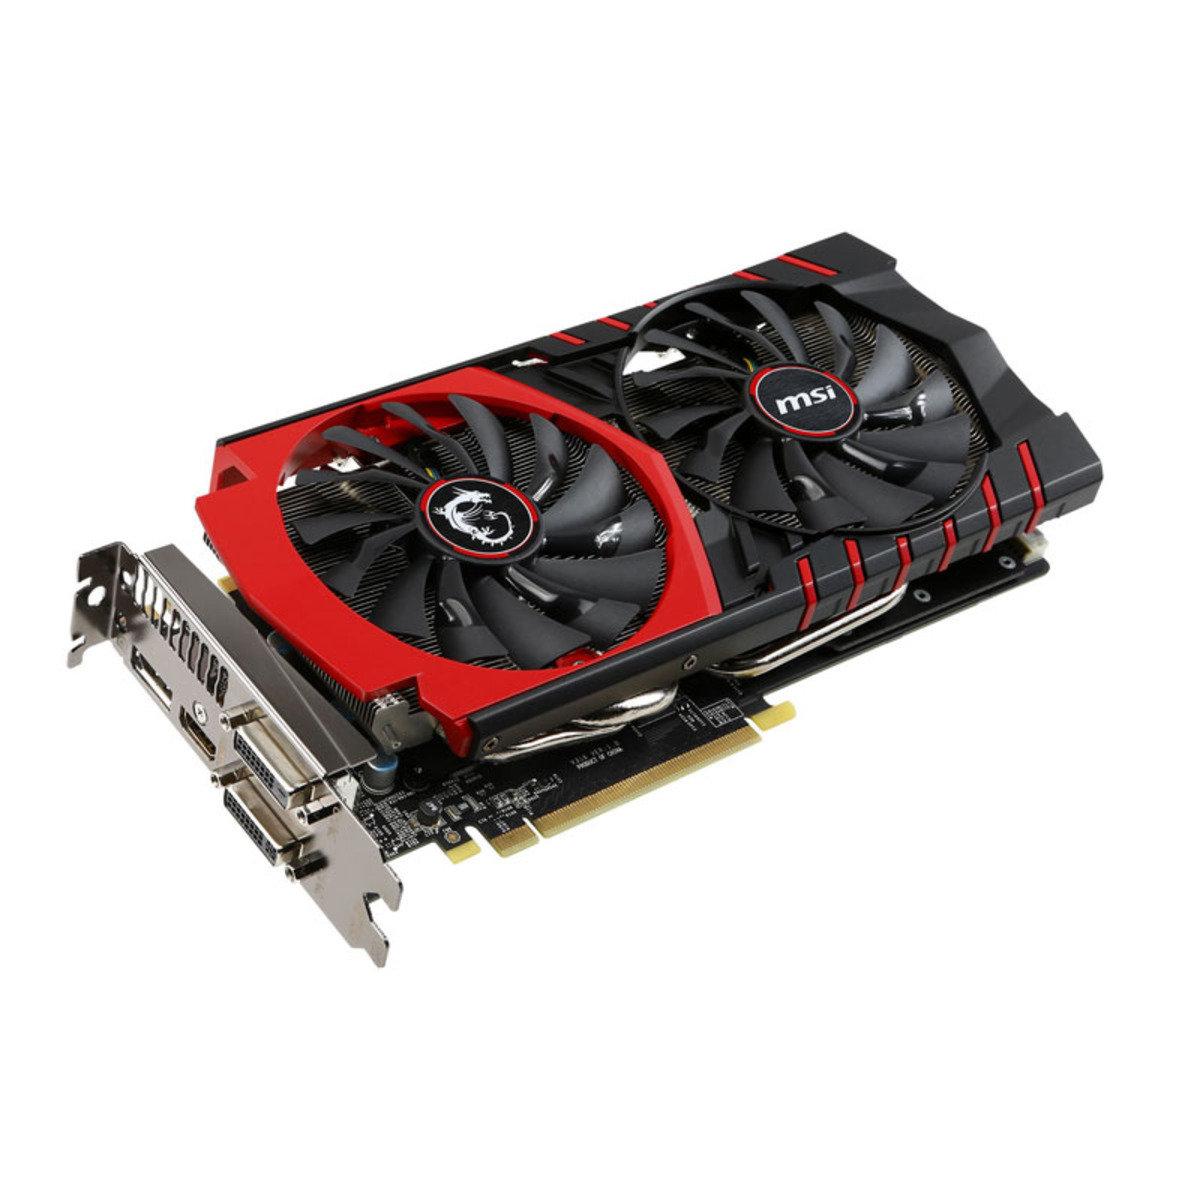 GTX970 4GB GDDR5 PCI-E 高效能獨立顯示卡 GTX 970 GAMING 4G